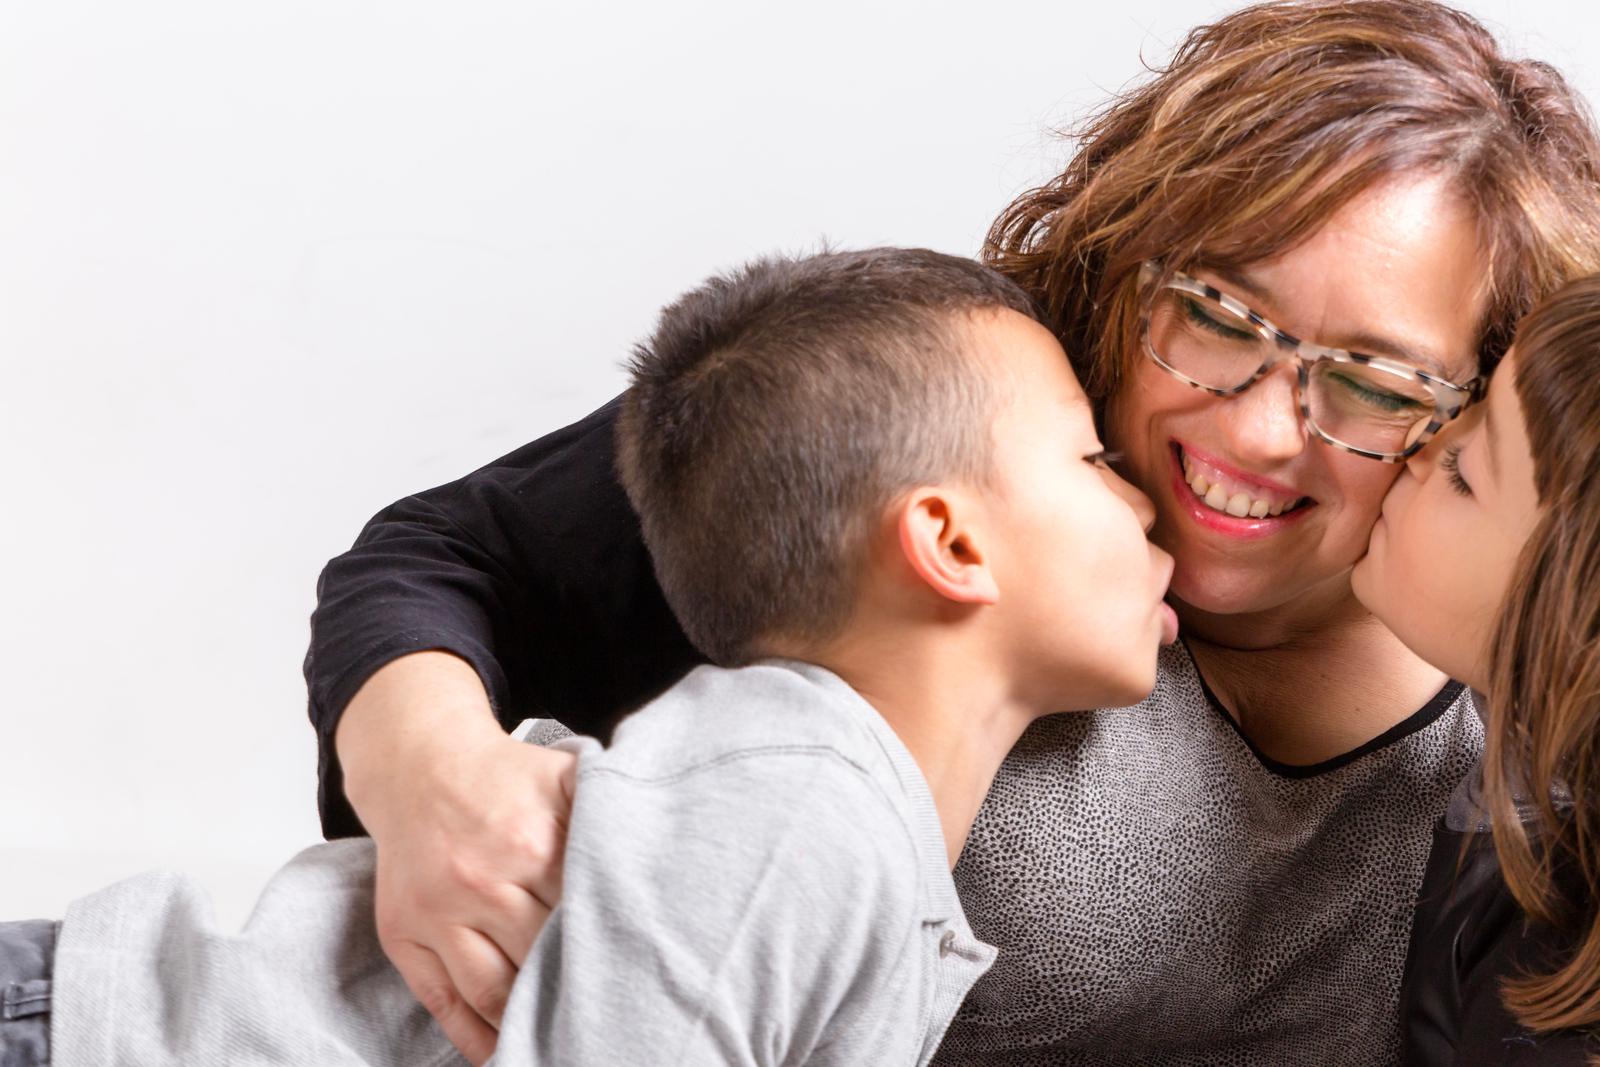 Niños besan a su mamá. Reportajes de fotografía infantil para ver crecer la familia. fotografo infantil, fotografo familia, fotografo de navidad, elena rubio fotografa mollet para elenircfotografia, fotografa infantil barcelona 2